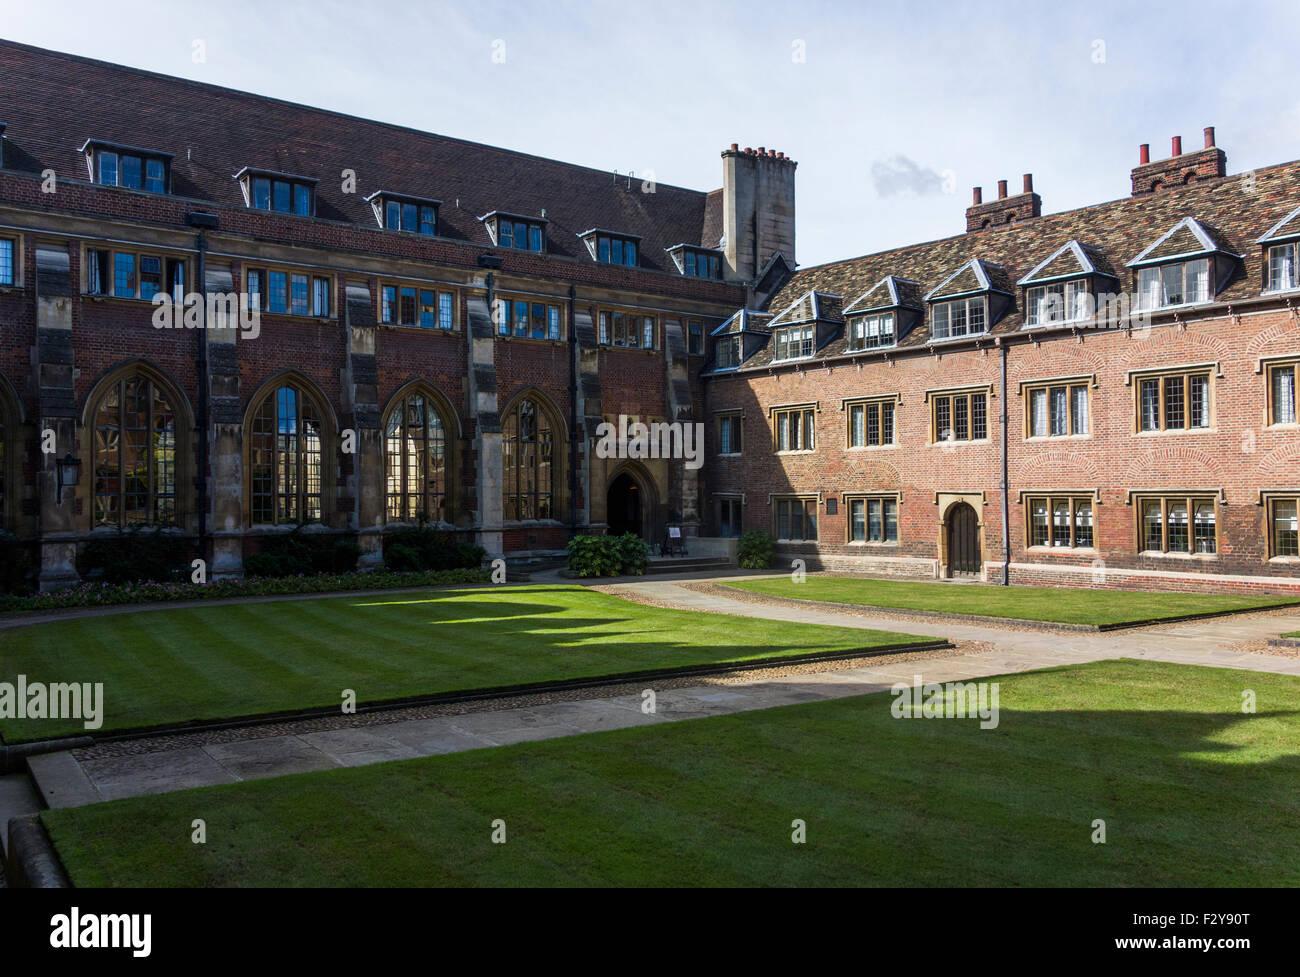 view towards northwest, Ivy Court, Pembroke College, Cambridge, England, UK - Stock Image